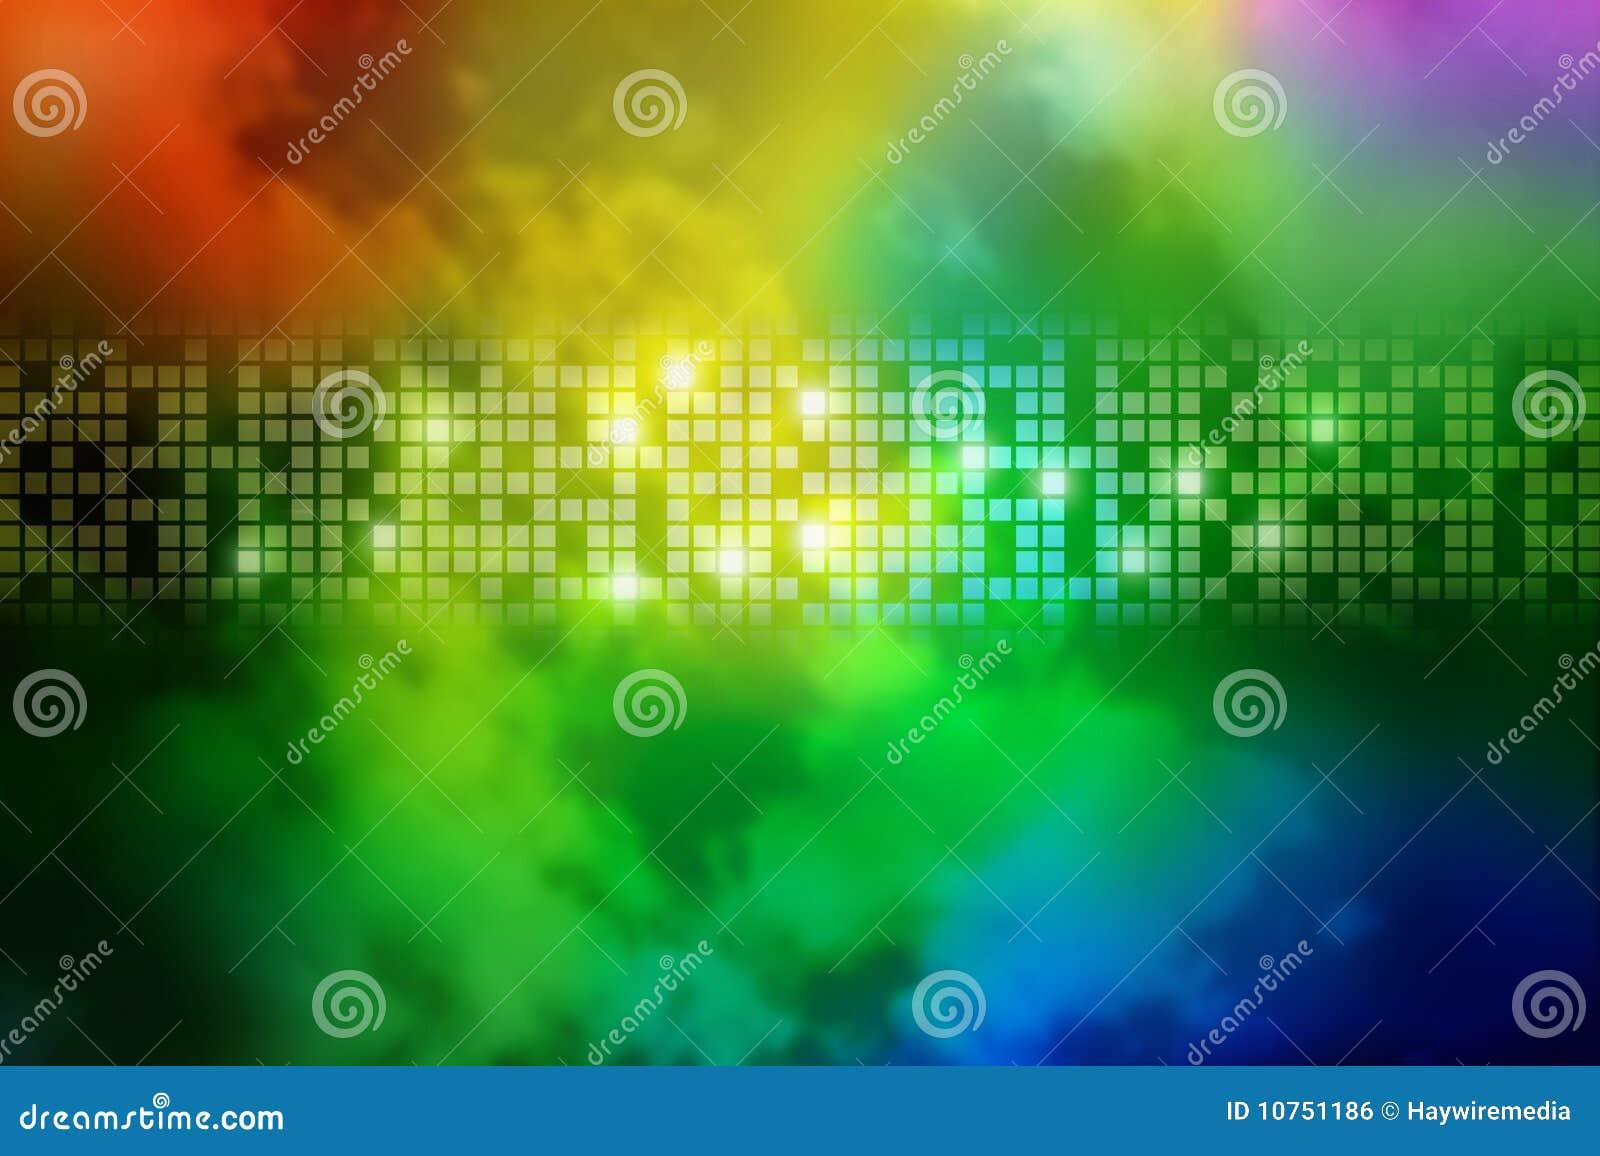 Abstract Rainbow Smoke Square Background Stock Photo